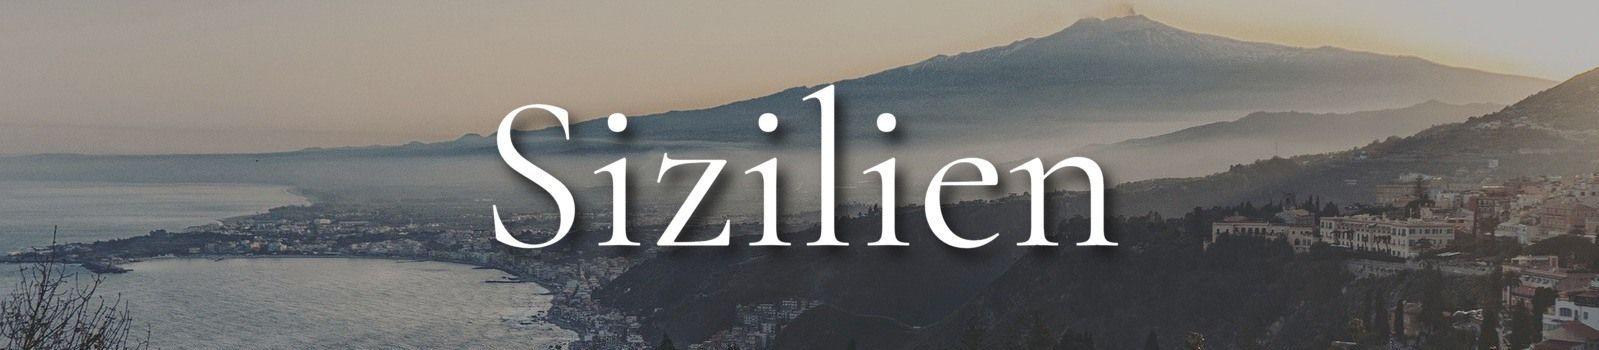 Sizilien Banner